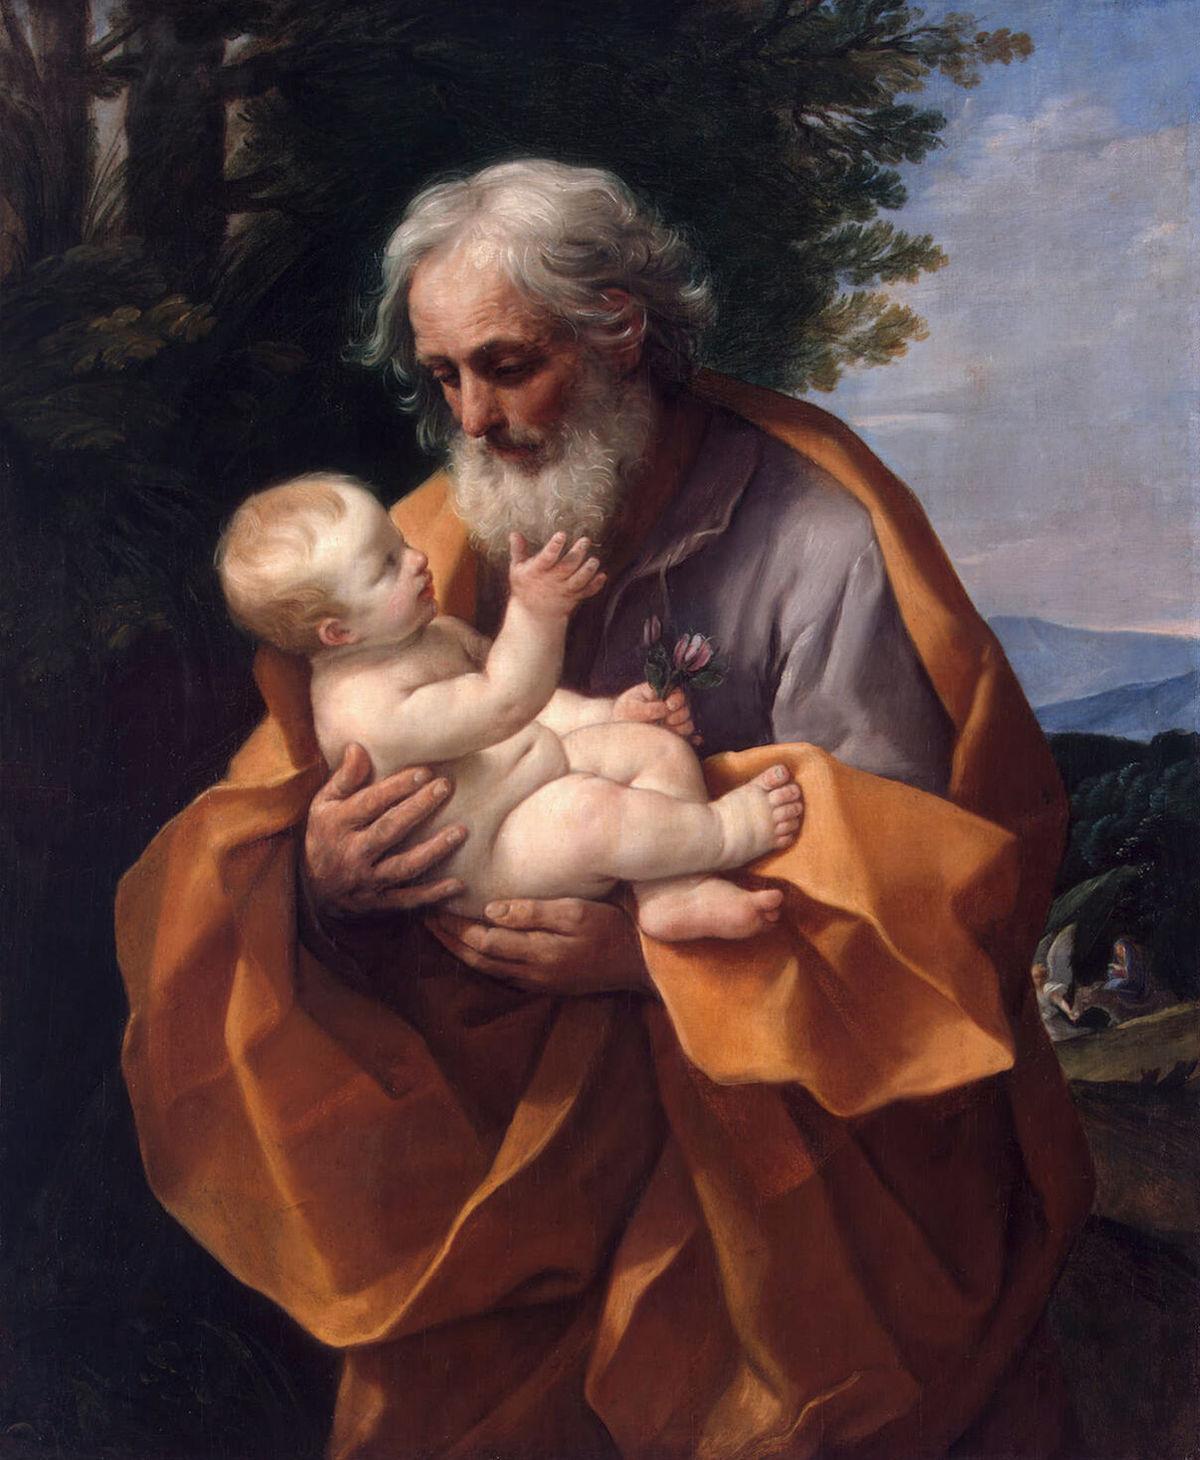 San Giuseppe e il bambino Gesù in un dipinto di Guido Reni.